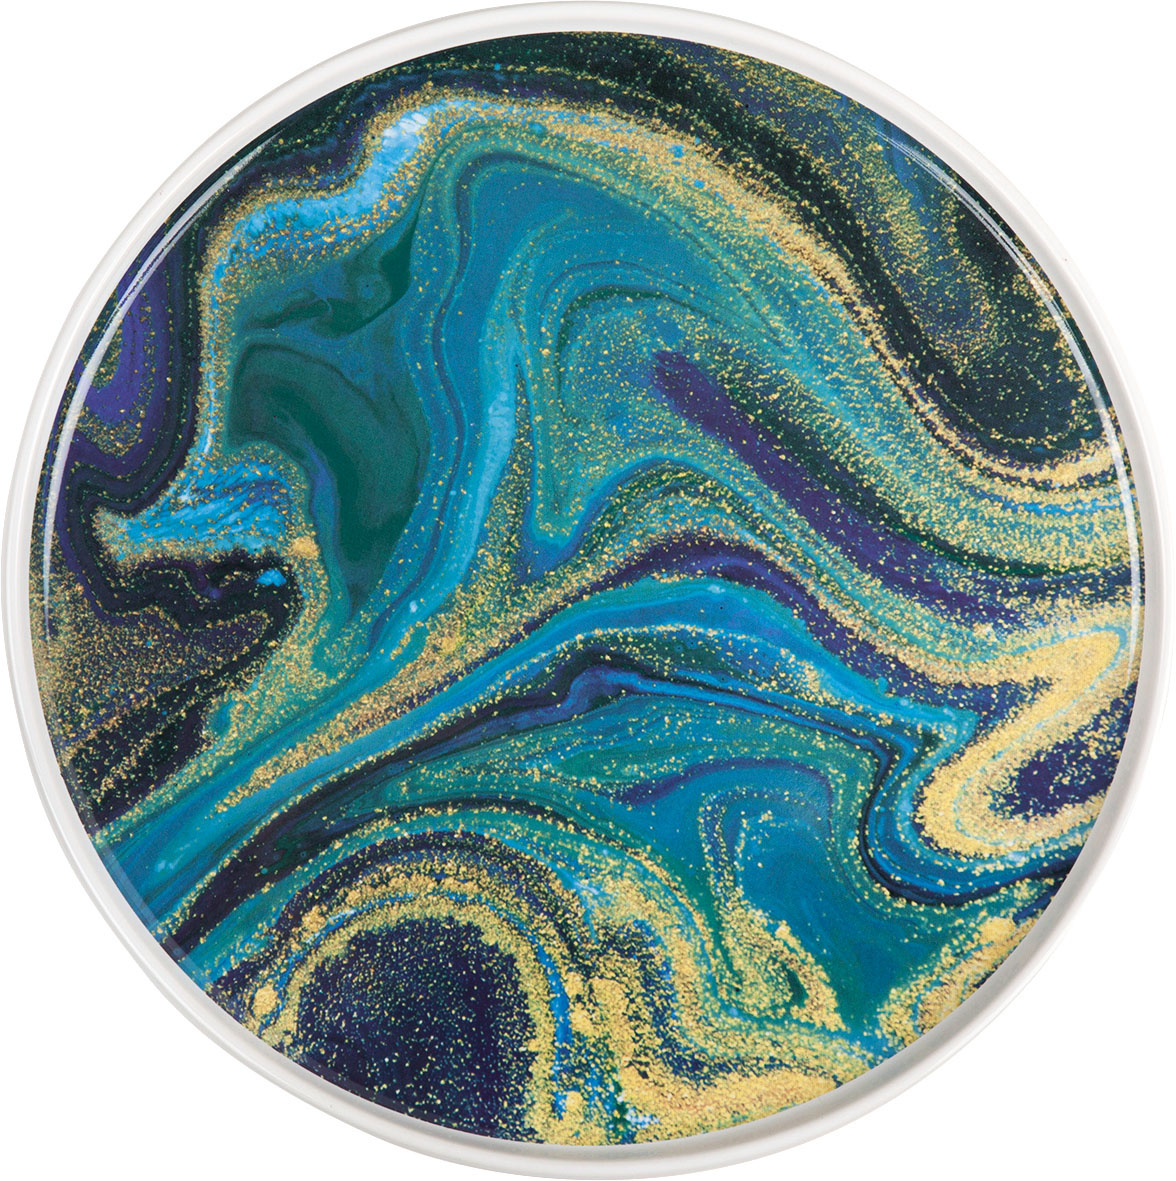 drp_orval_plat_service_rond_mineral_marbre_otvaprro0010.jpg